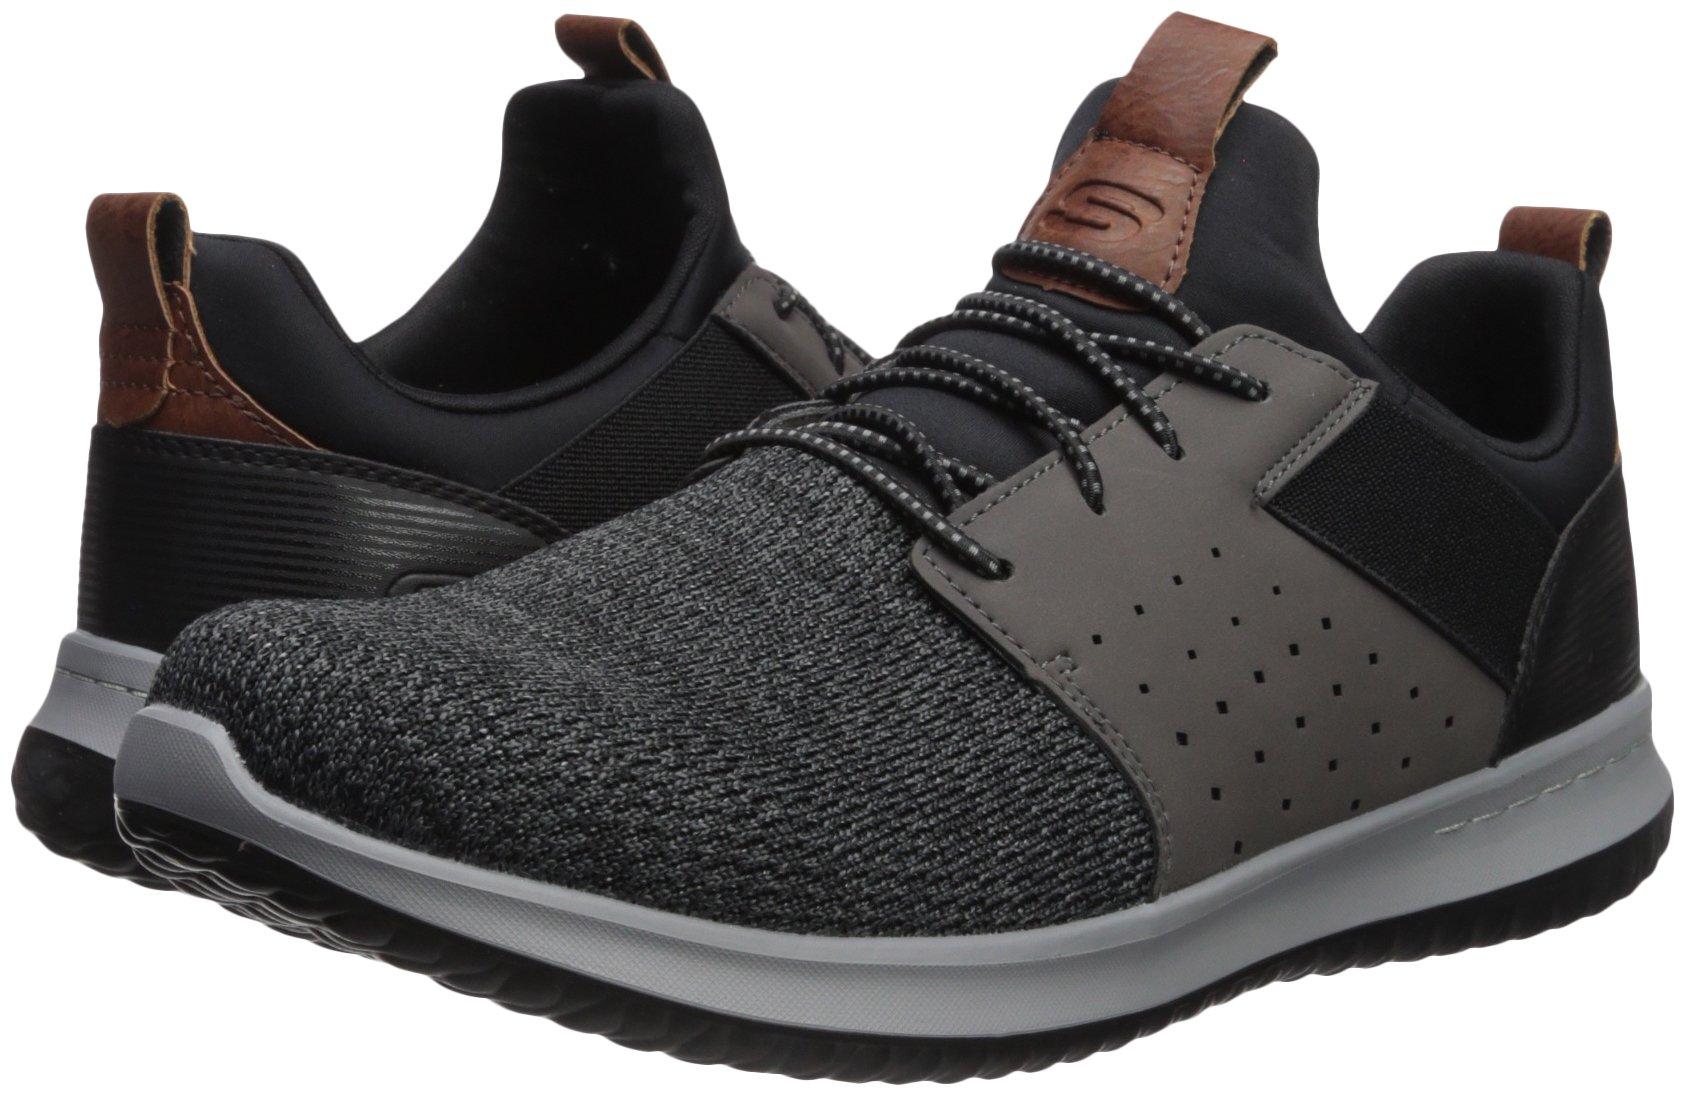 Skechers Men's Classic Fit-Delson-Camden Sneaker,black/Grey,11 M US